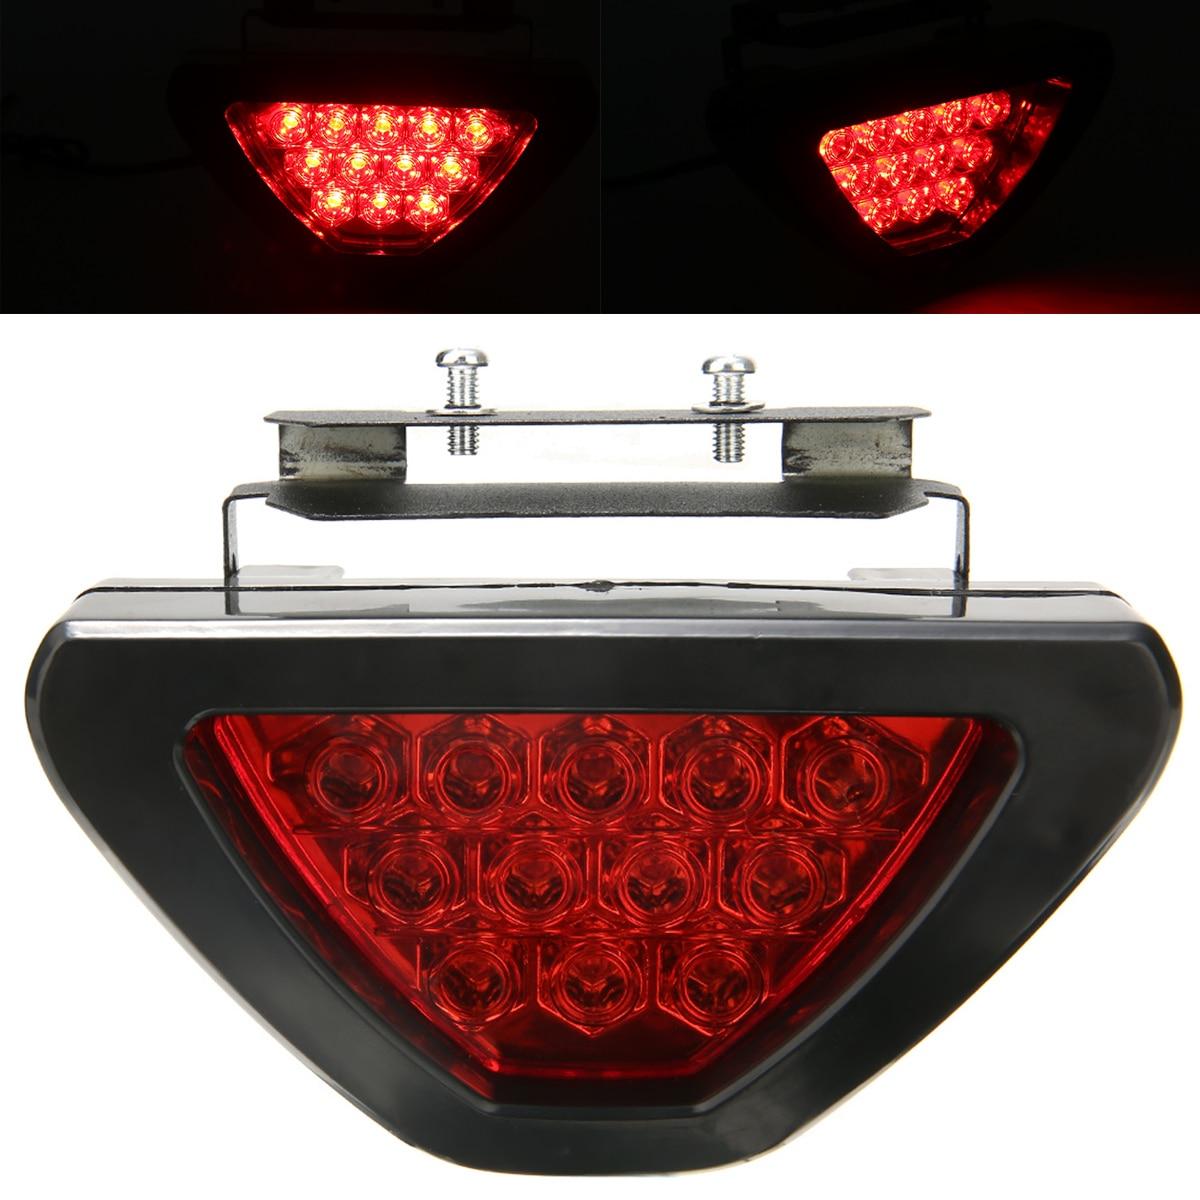 Mayitr 1pcs Car Tail Brake Light Universal F1 Style 12LED Red Third Rear Stop Lamp Safety Lights